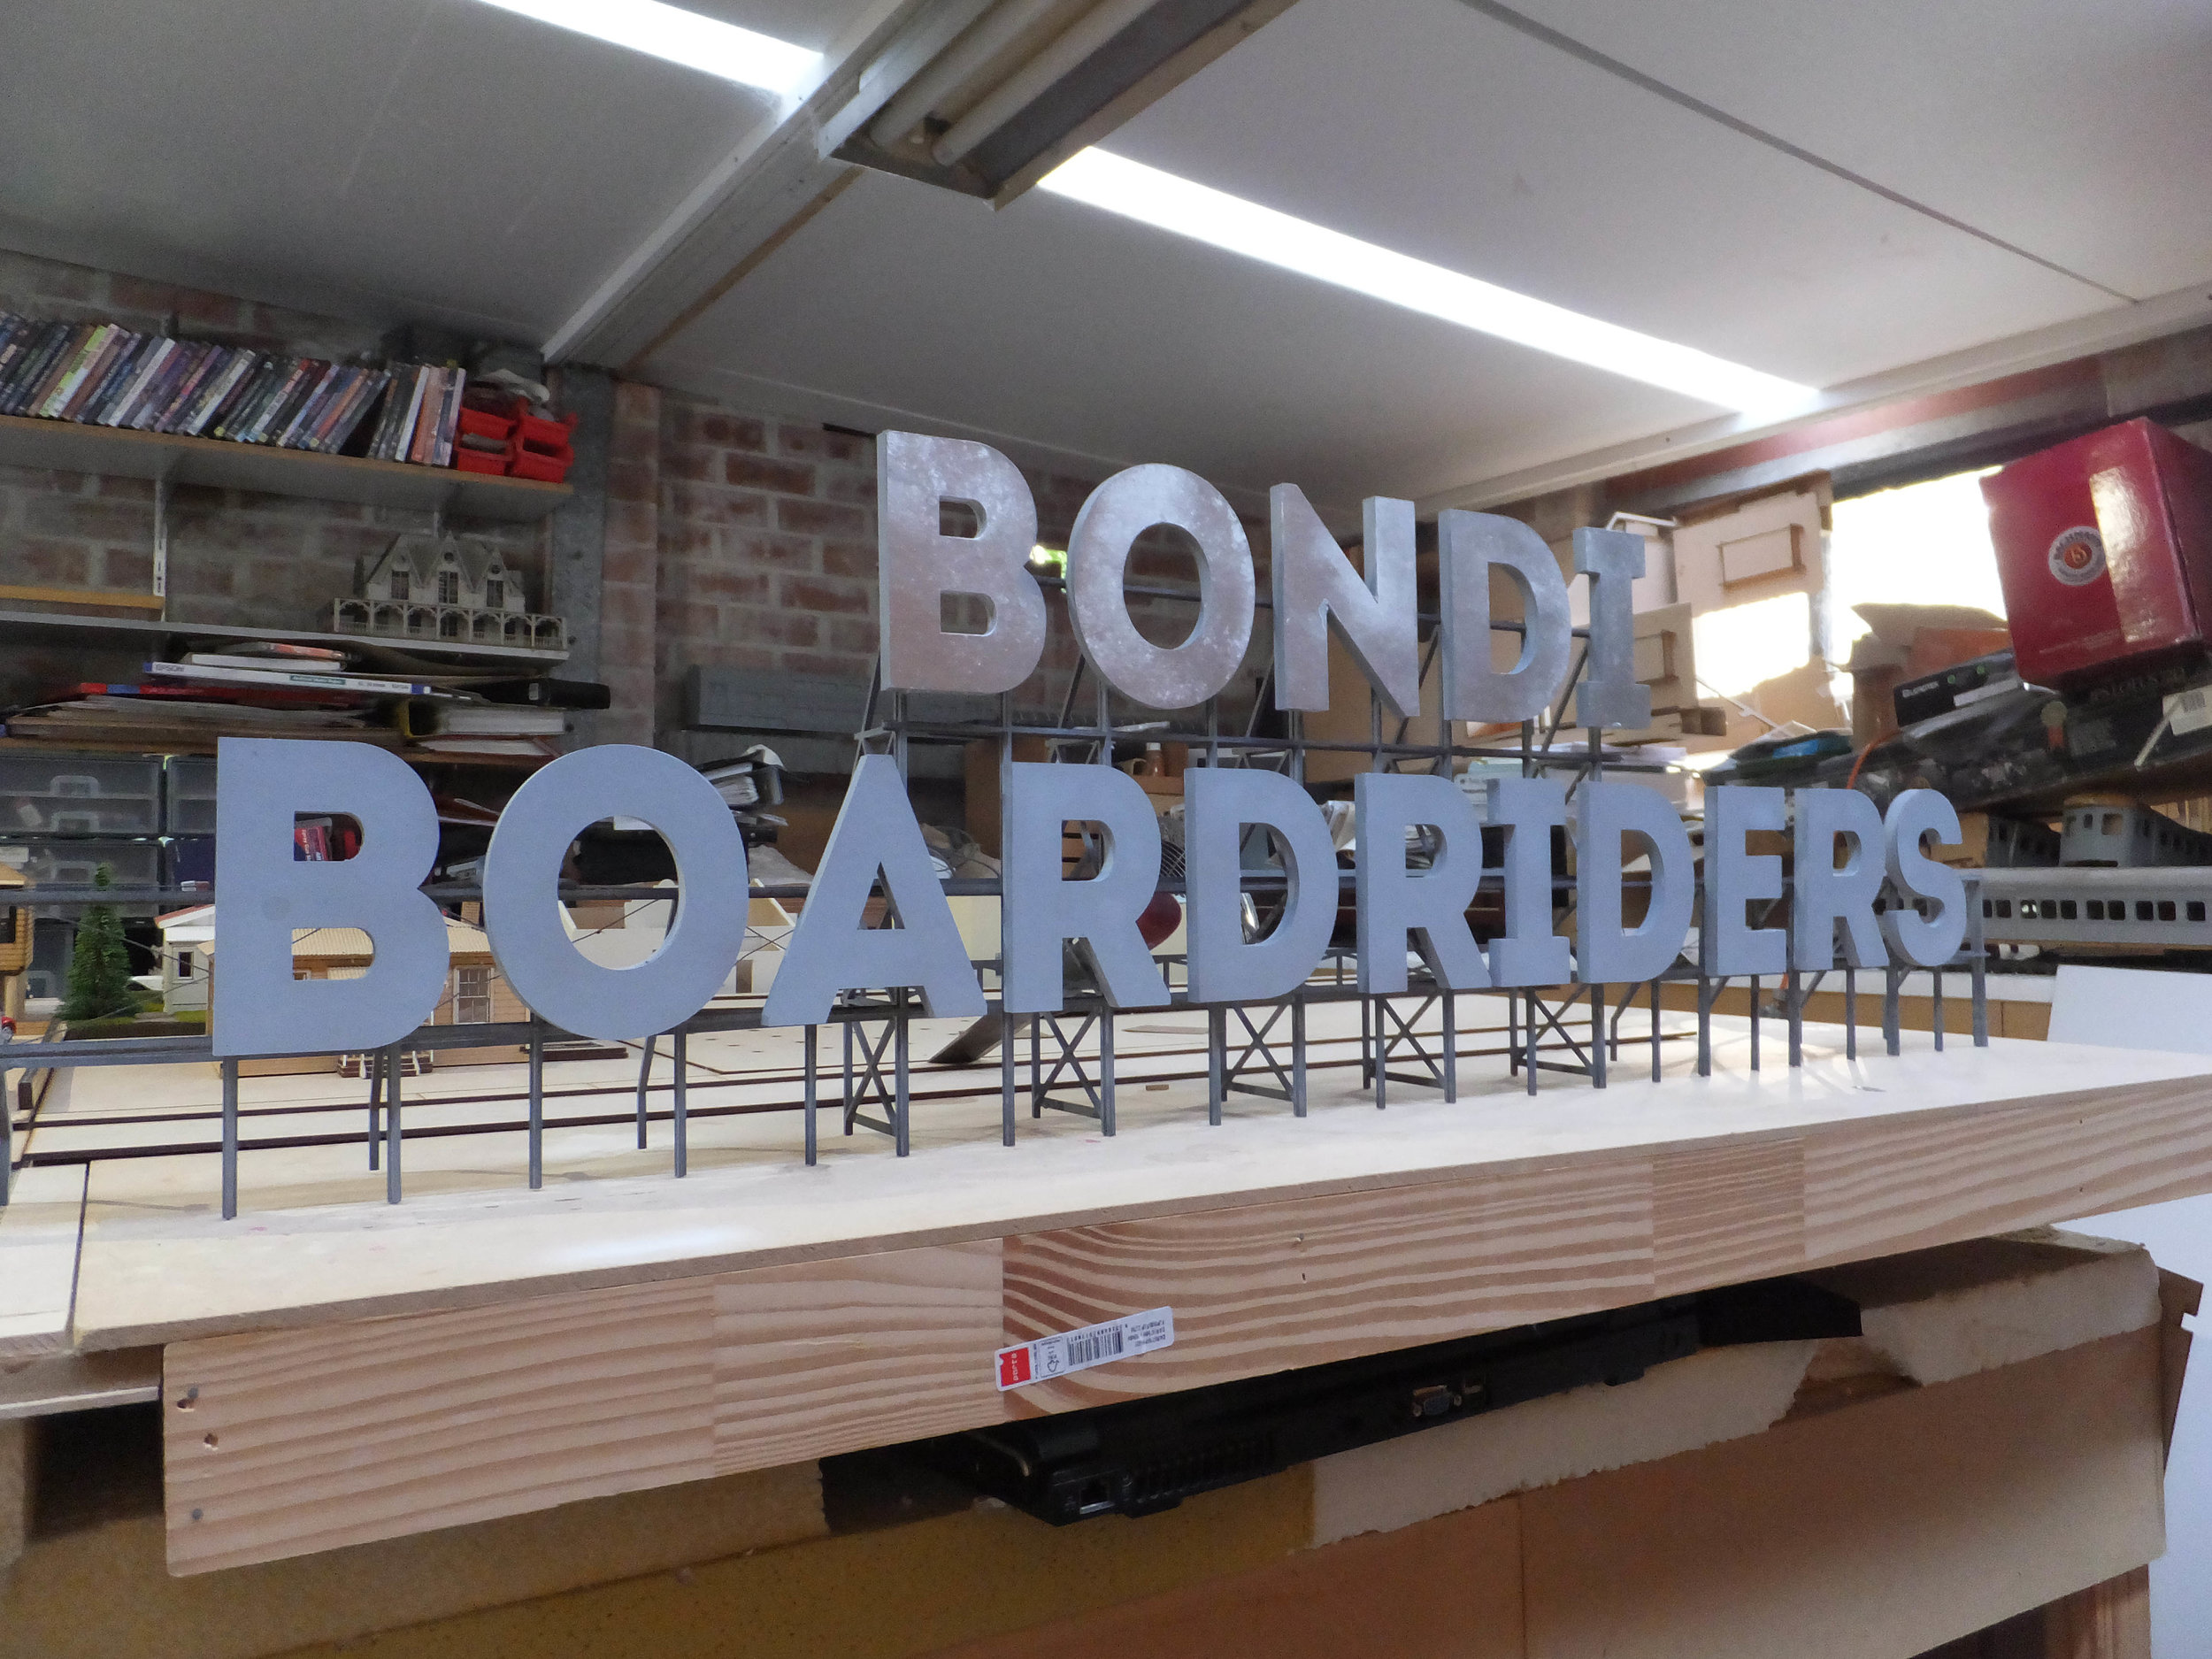 Bondi boardriders test copy.jpg